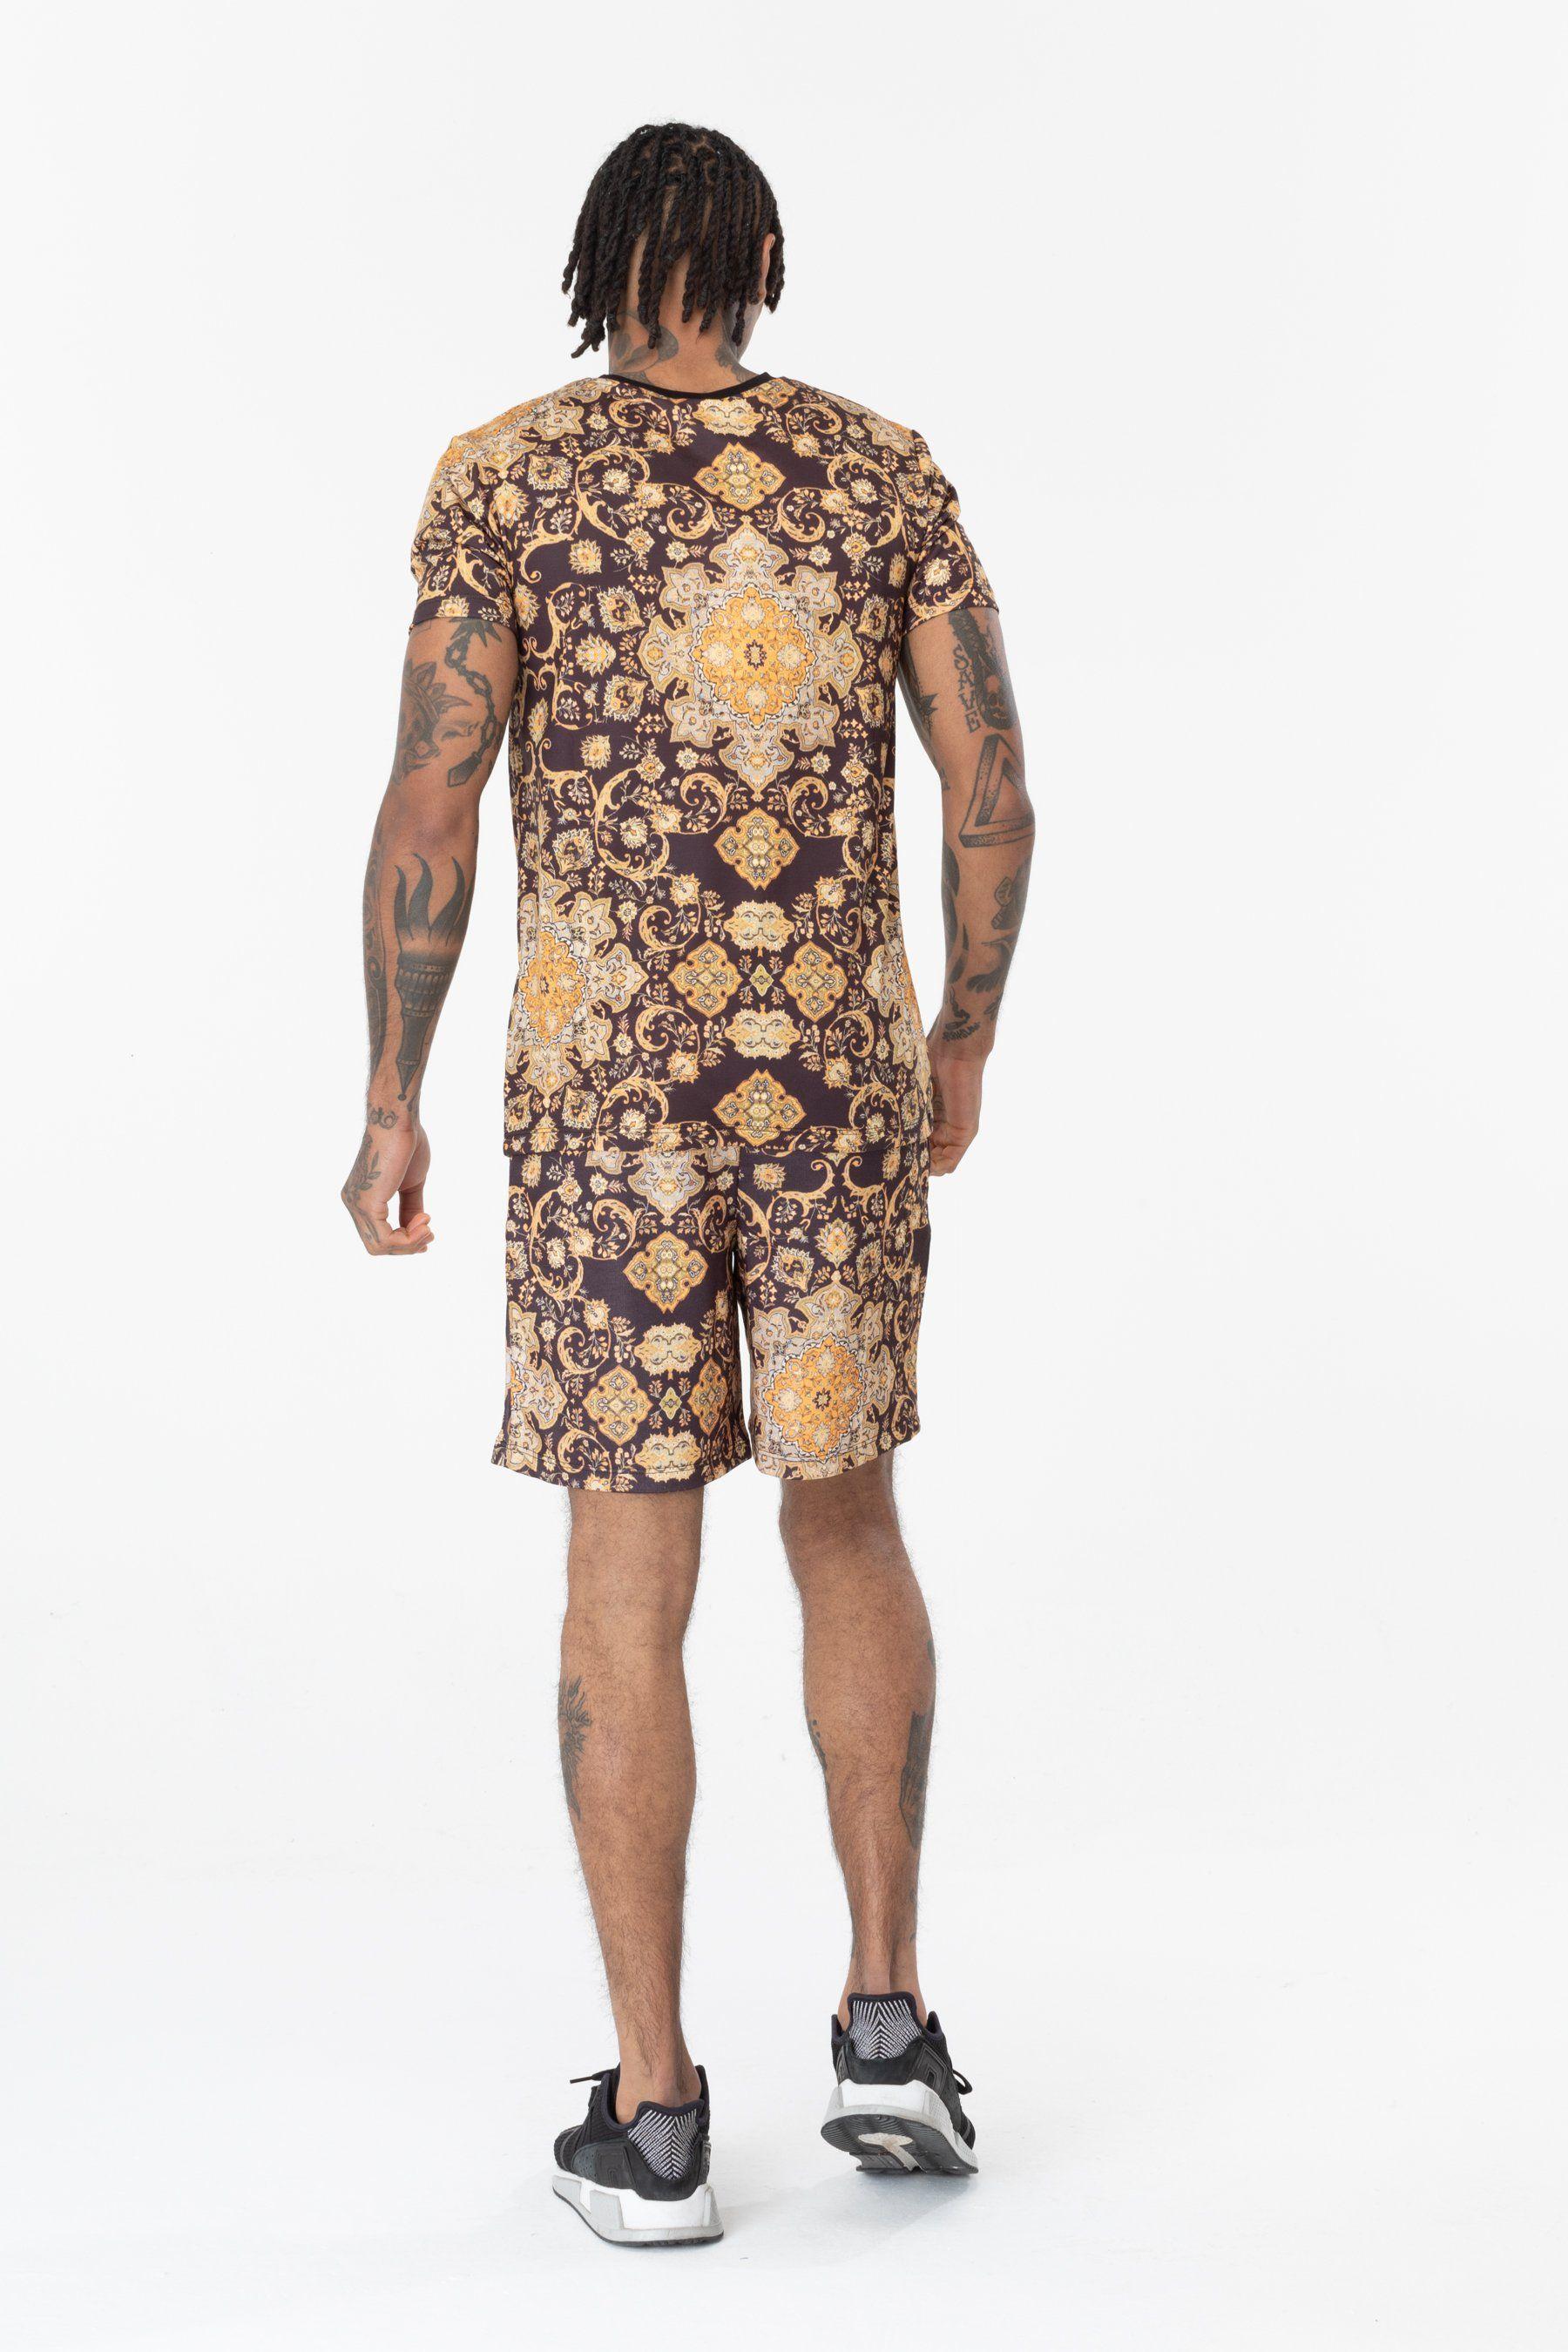 Hype Sace Mens T-Shirt Xs